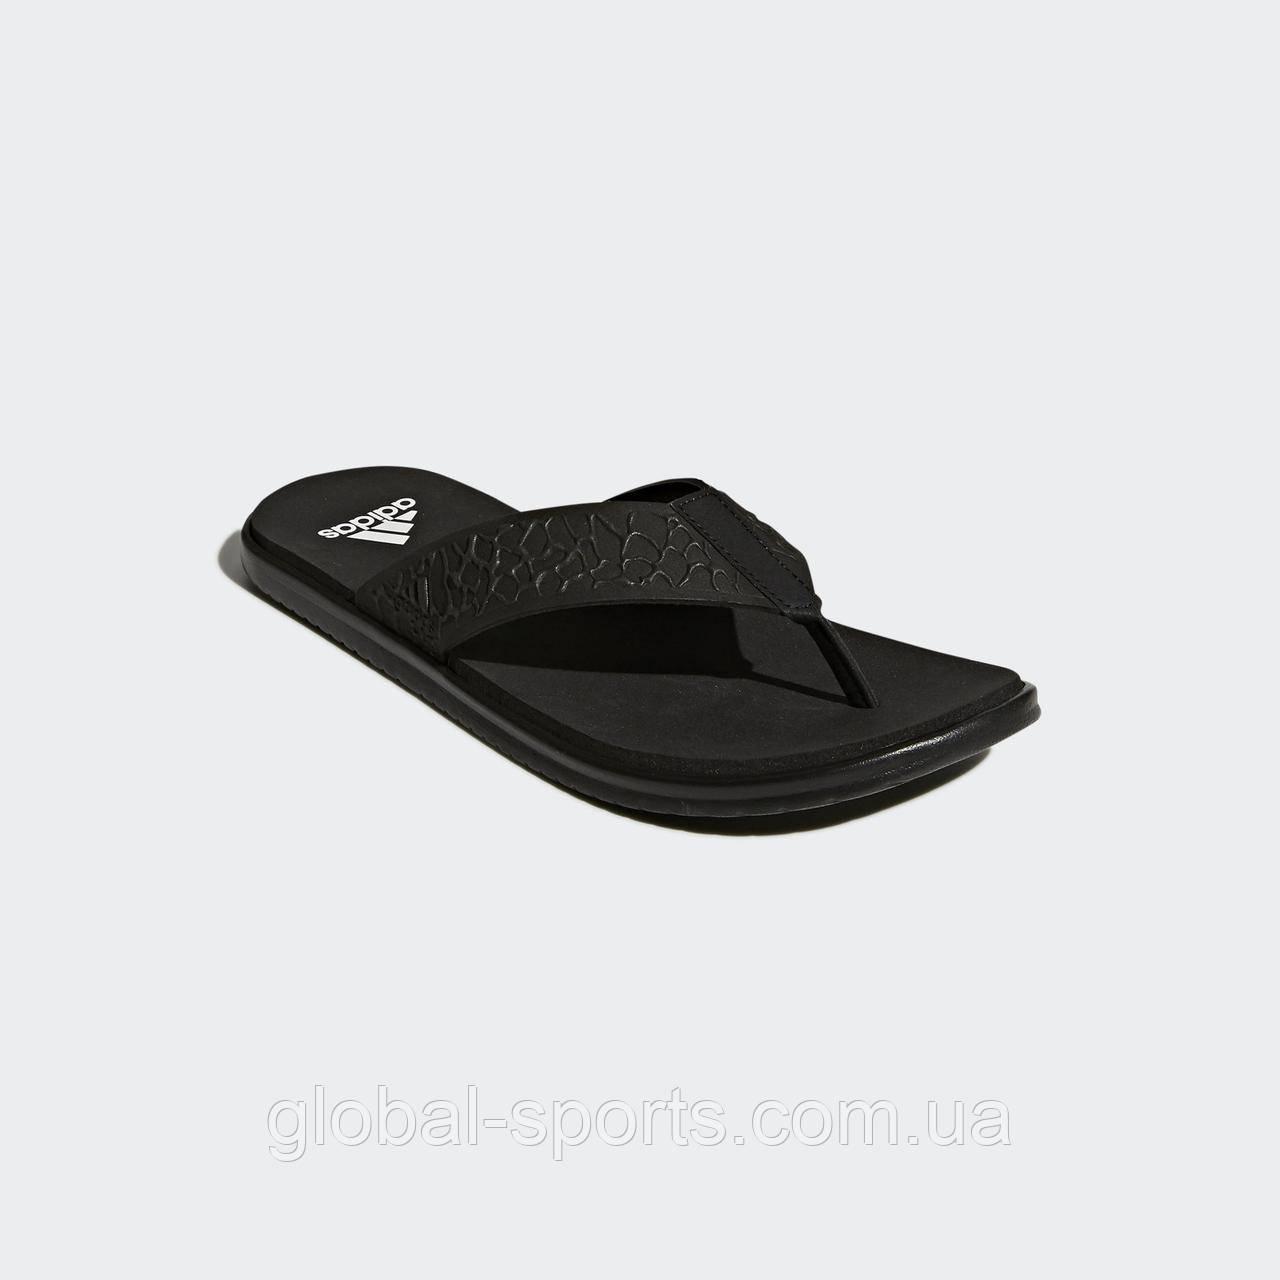 Мужские вьетнамки Adidas Beachcloud CF(Артикул:BB0503)